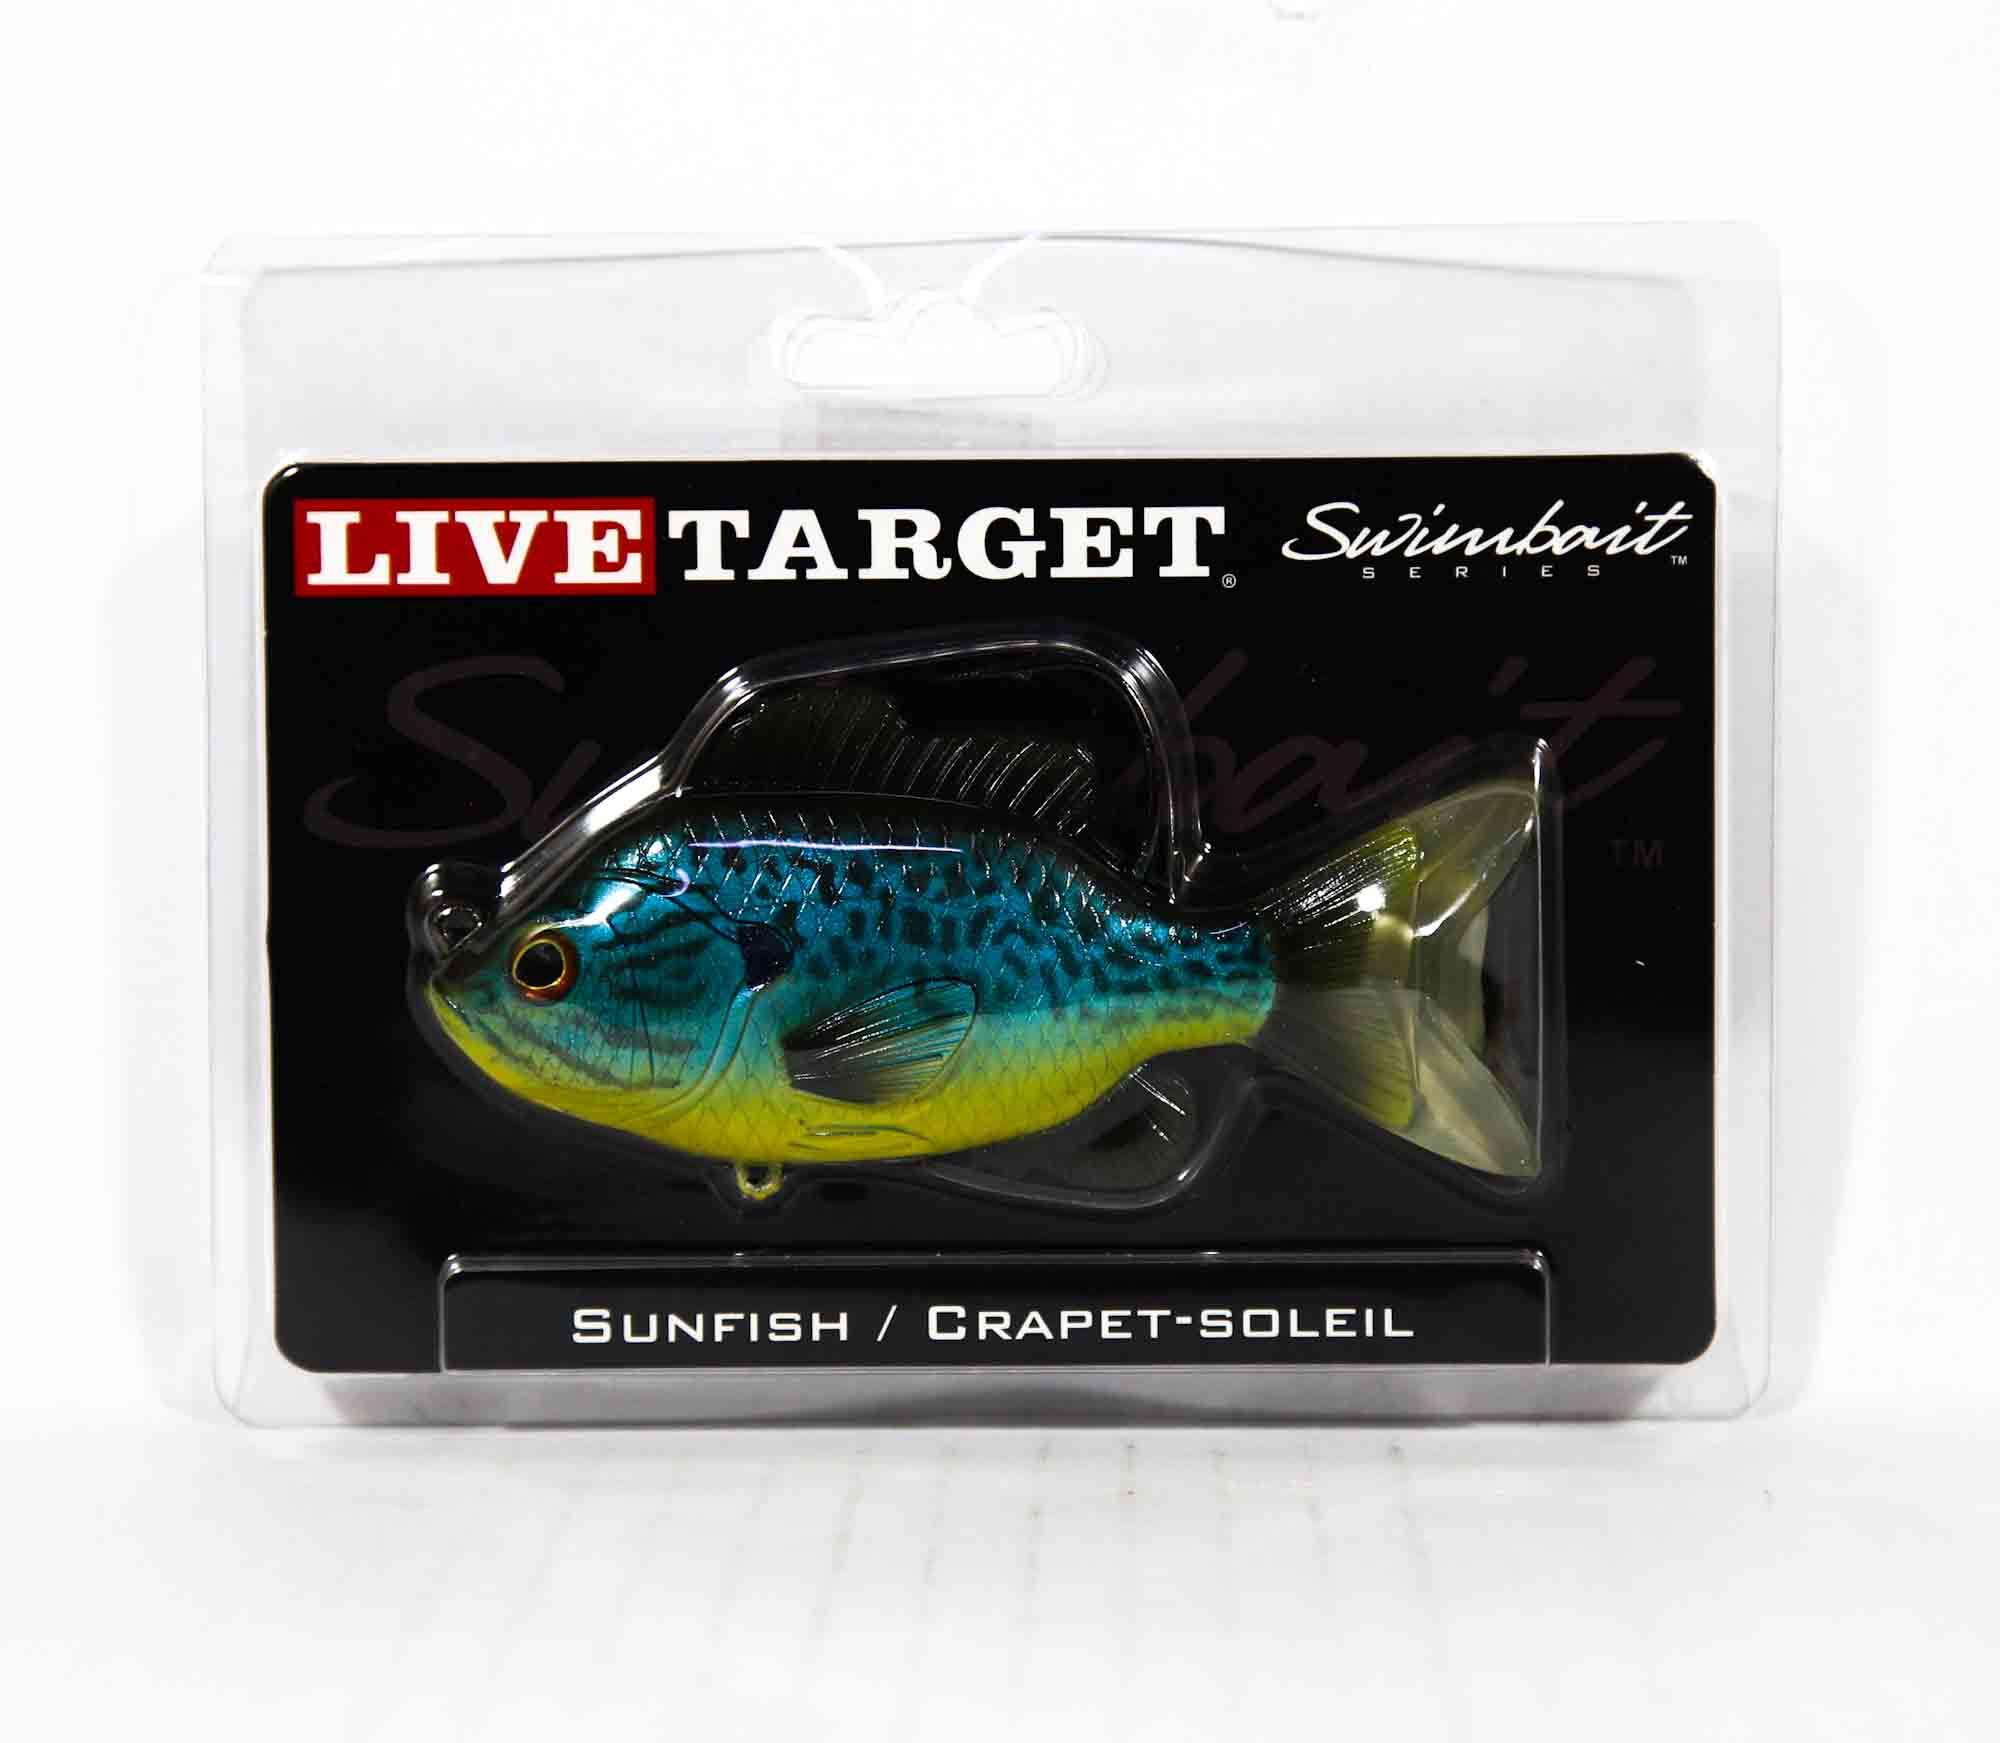 Live Target SFS110MS555 Swimbait Sunfish 4.75 Inch B Y Pumpkinseed (0651)